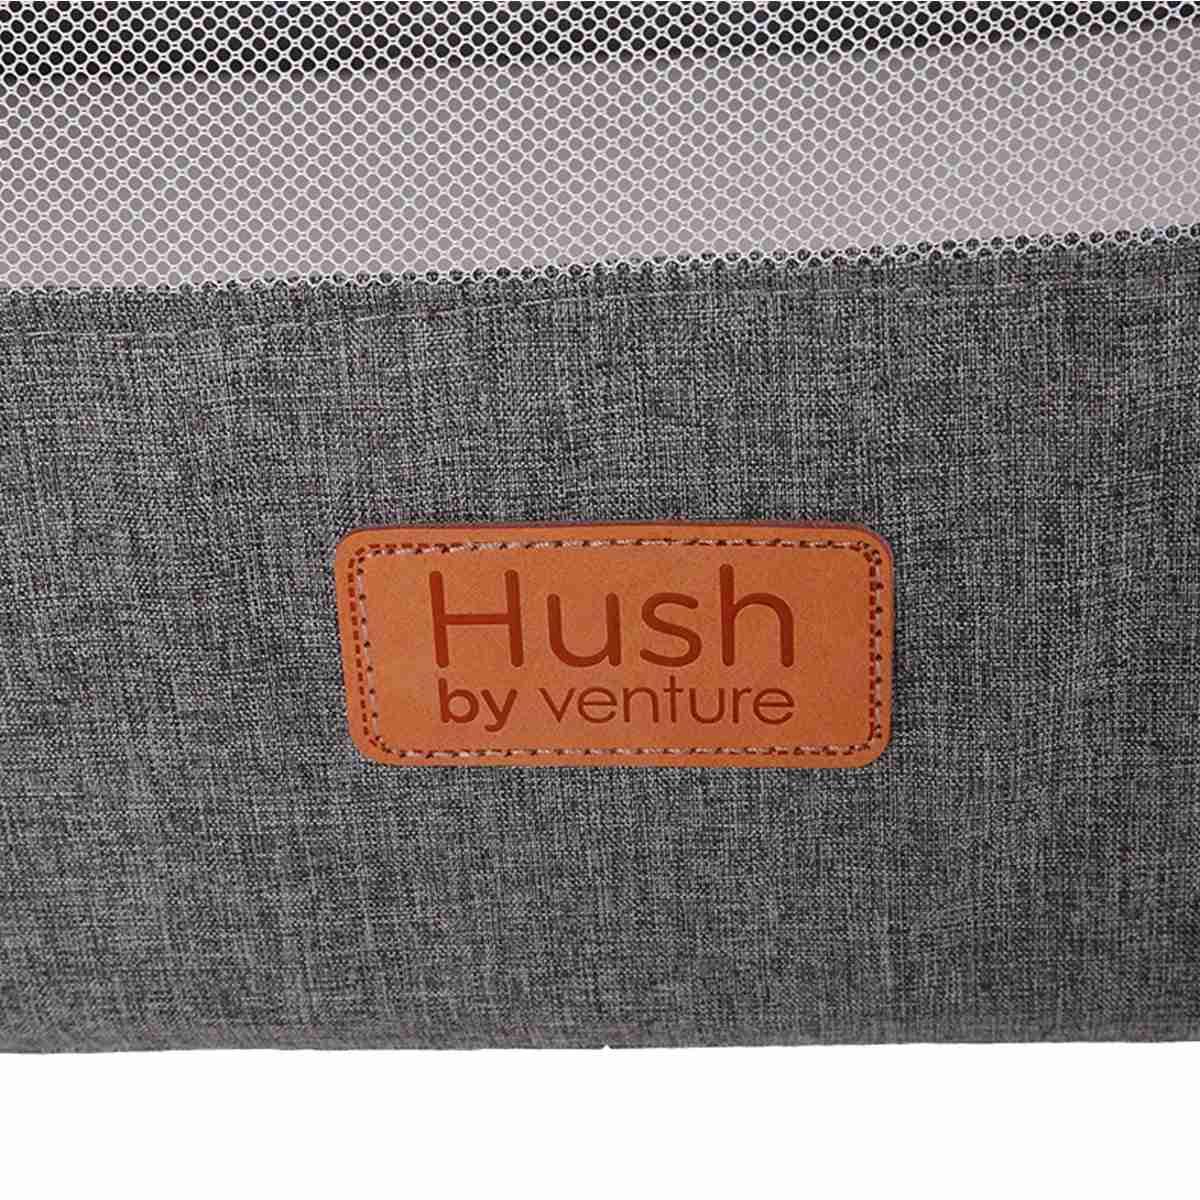 The Hush logo